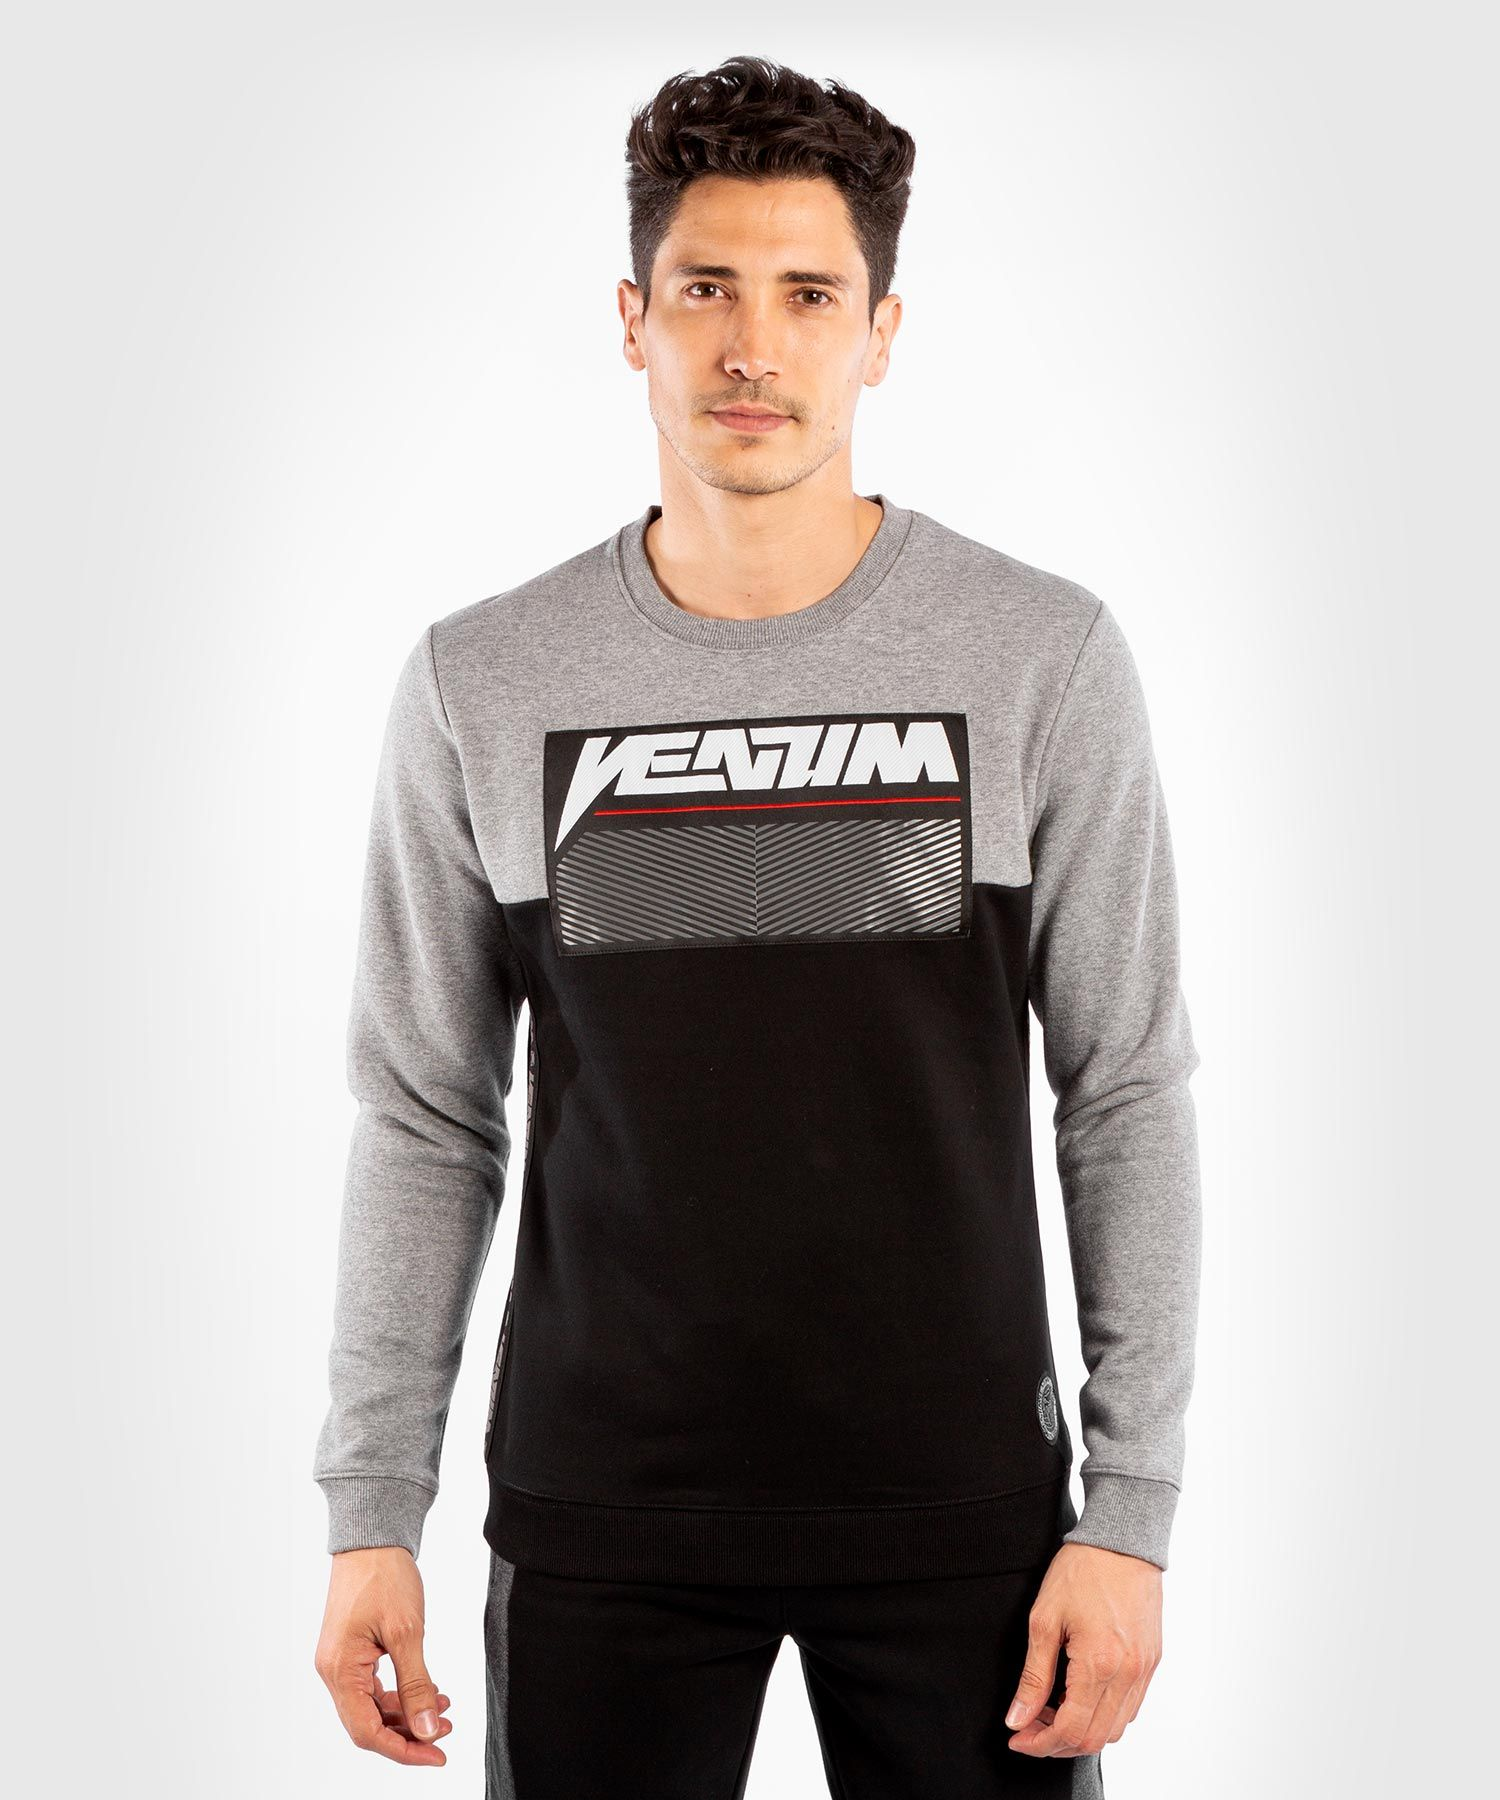 Venum Rafter Sweatshirt – Light Heather Grey